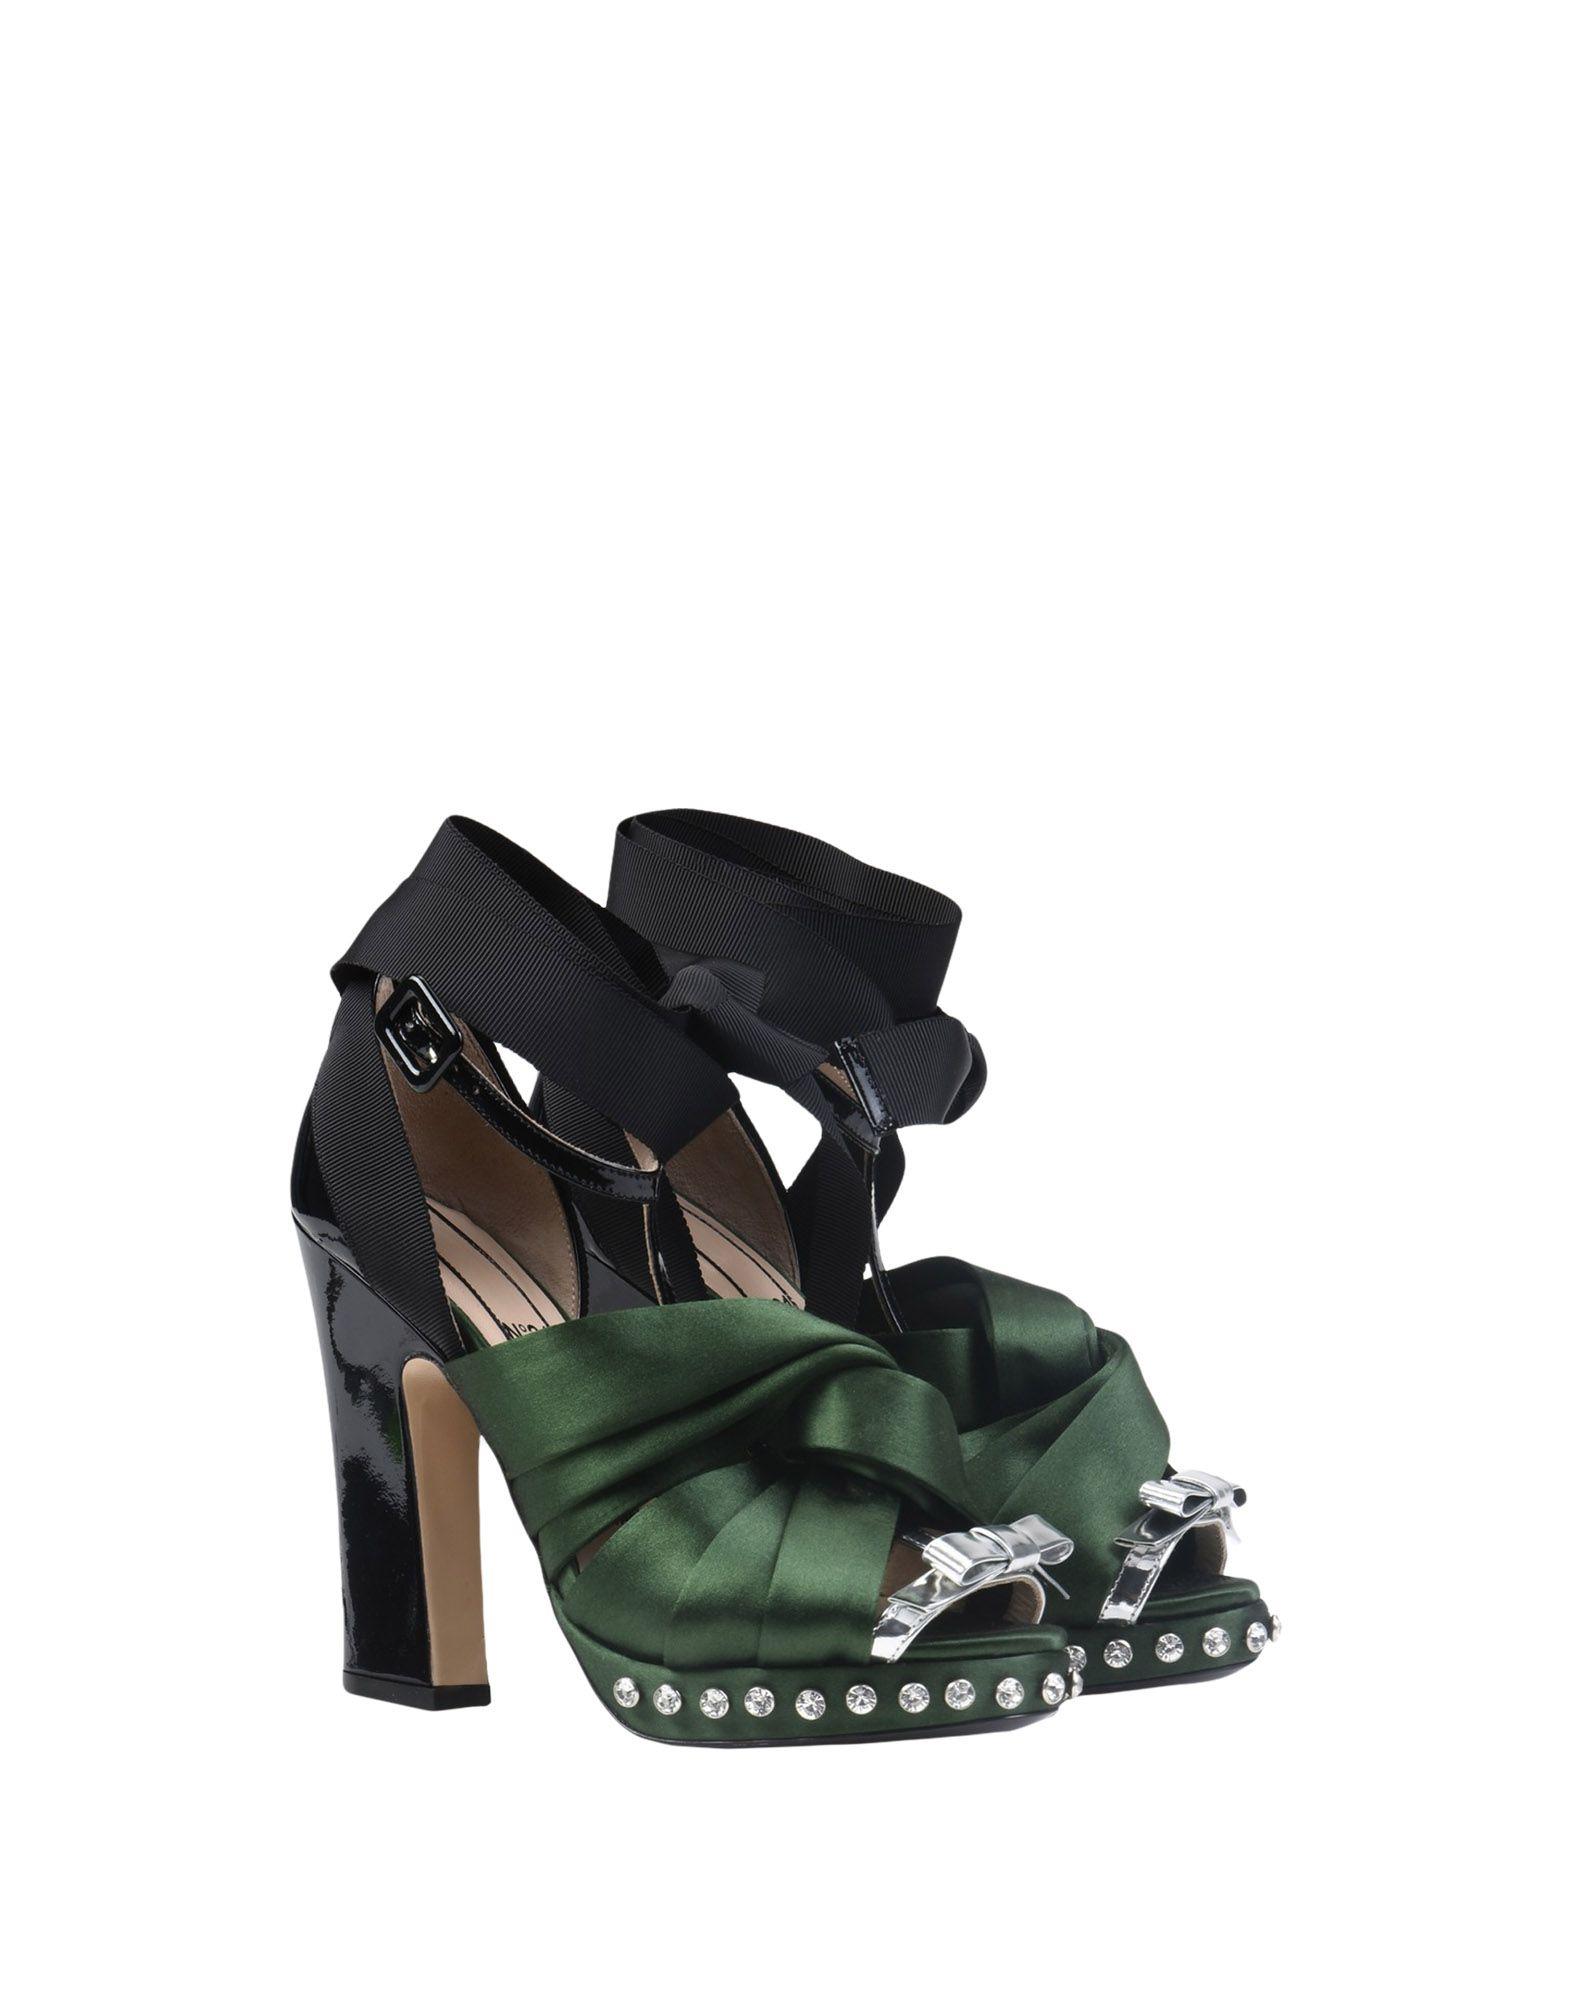 N° N° N° 21 Sandalen Damen  11452595EI Beliebte Schuhe 25b814